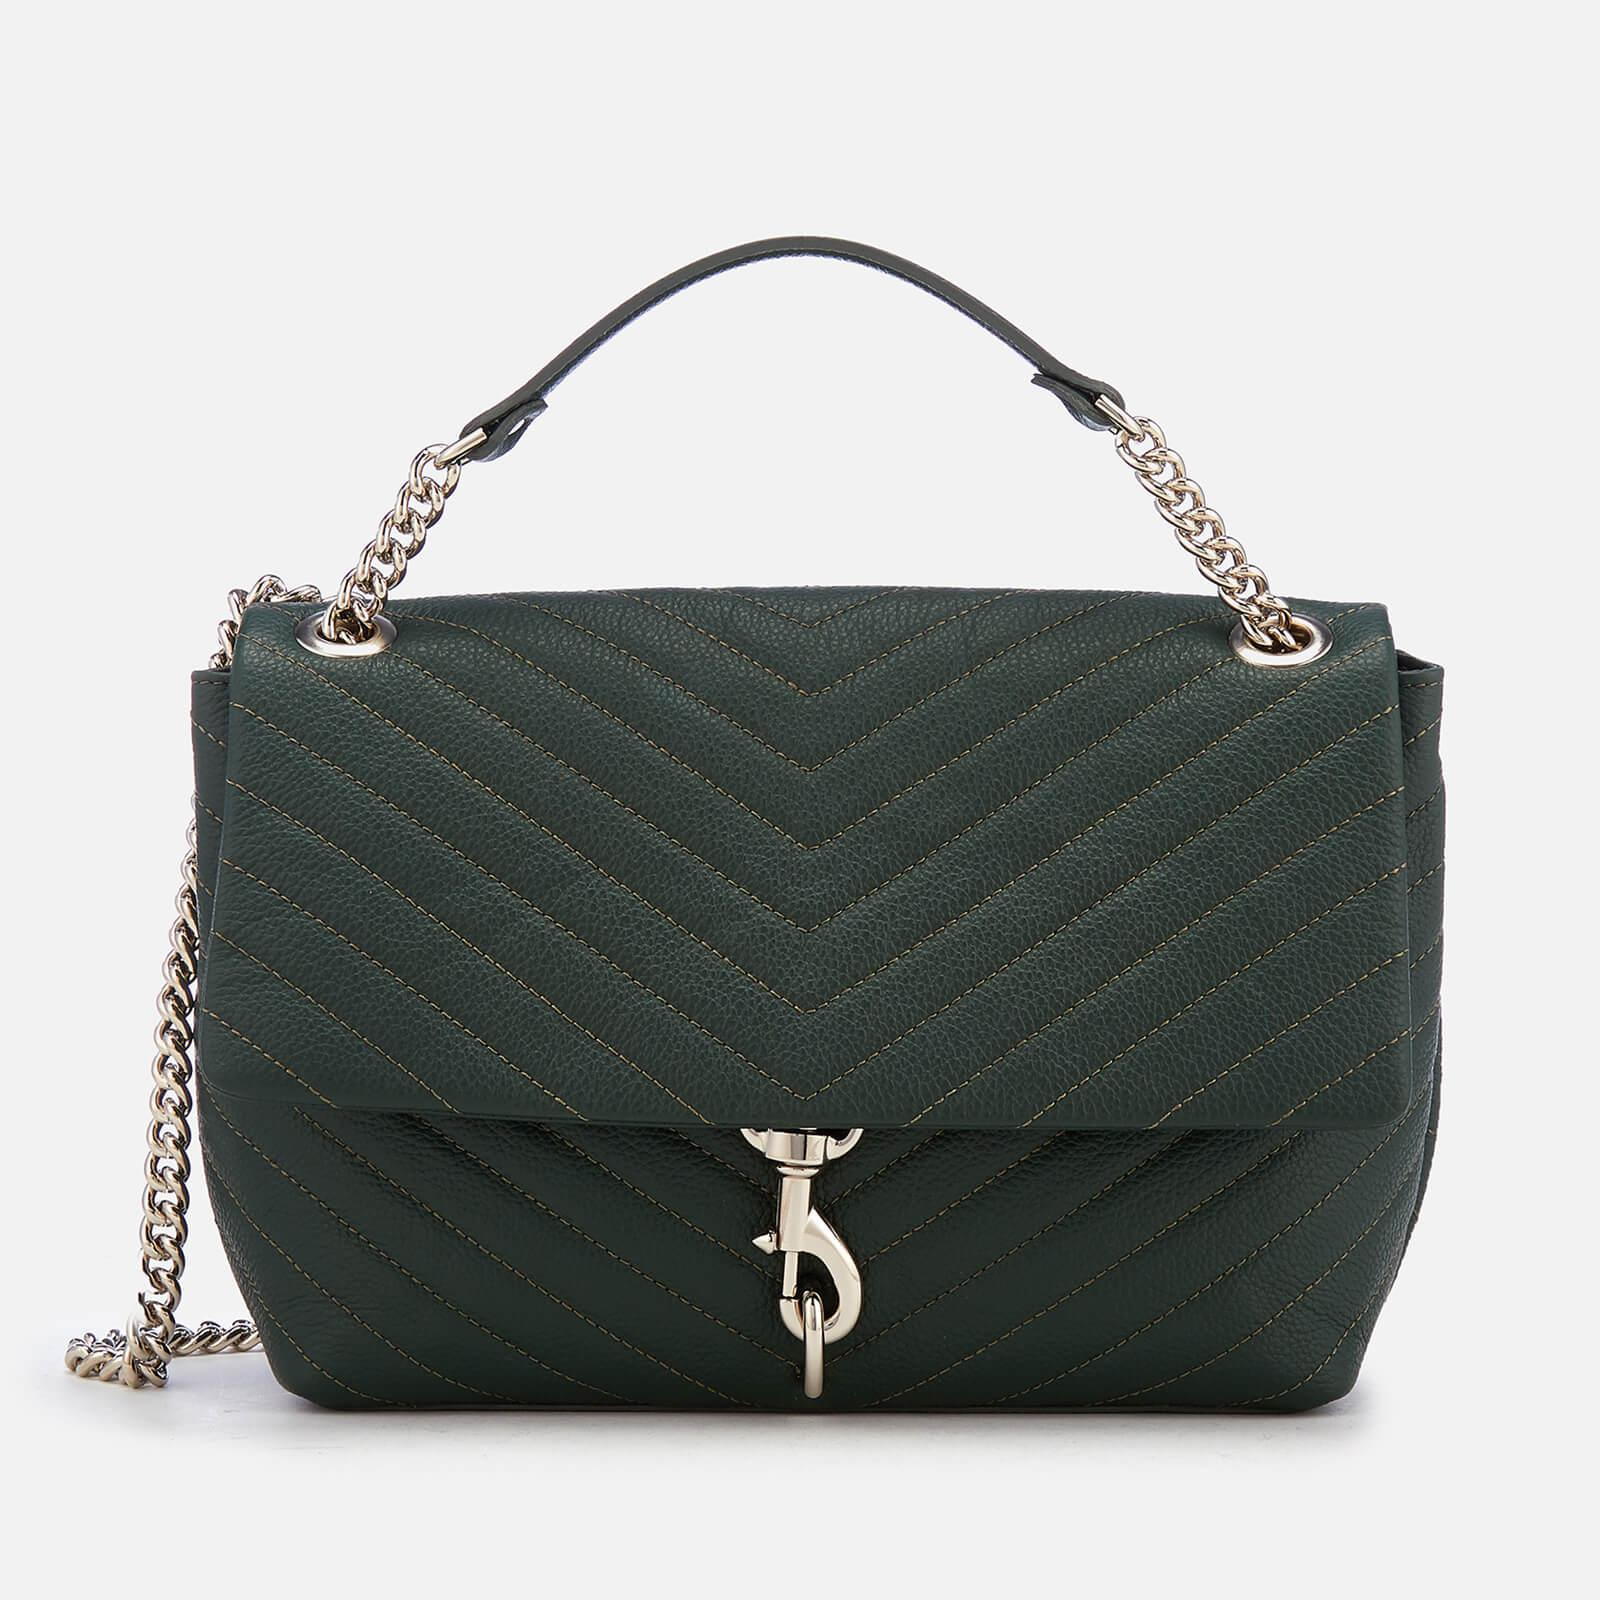 016258e046dbe Rebecca Minkoff Edie Flap Shoulder Bag in Green - Lyst